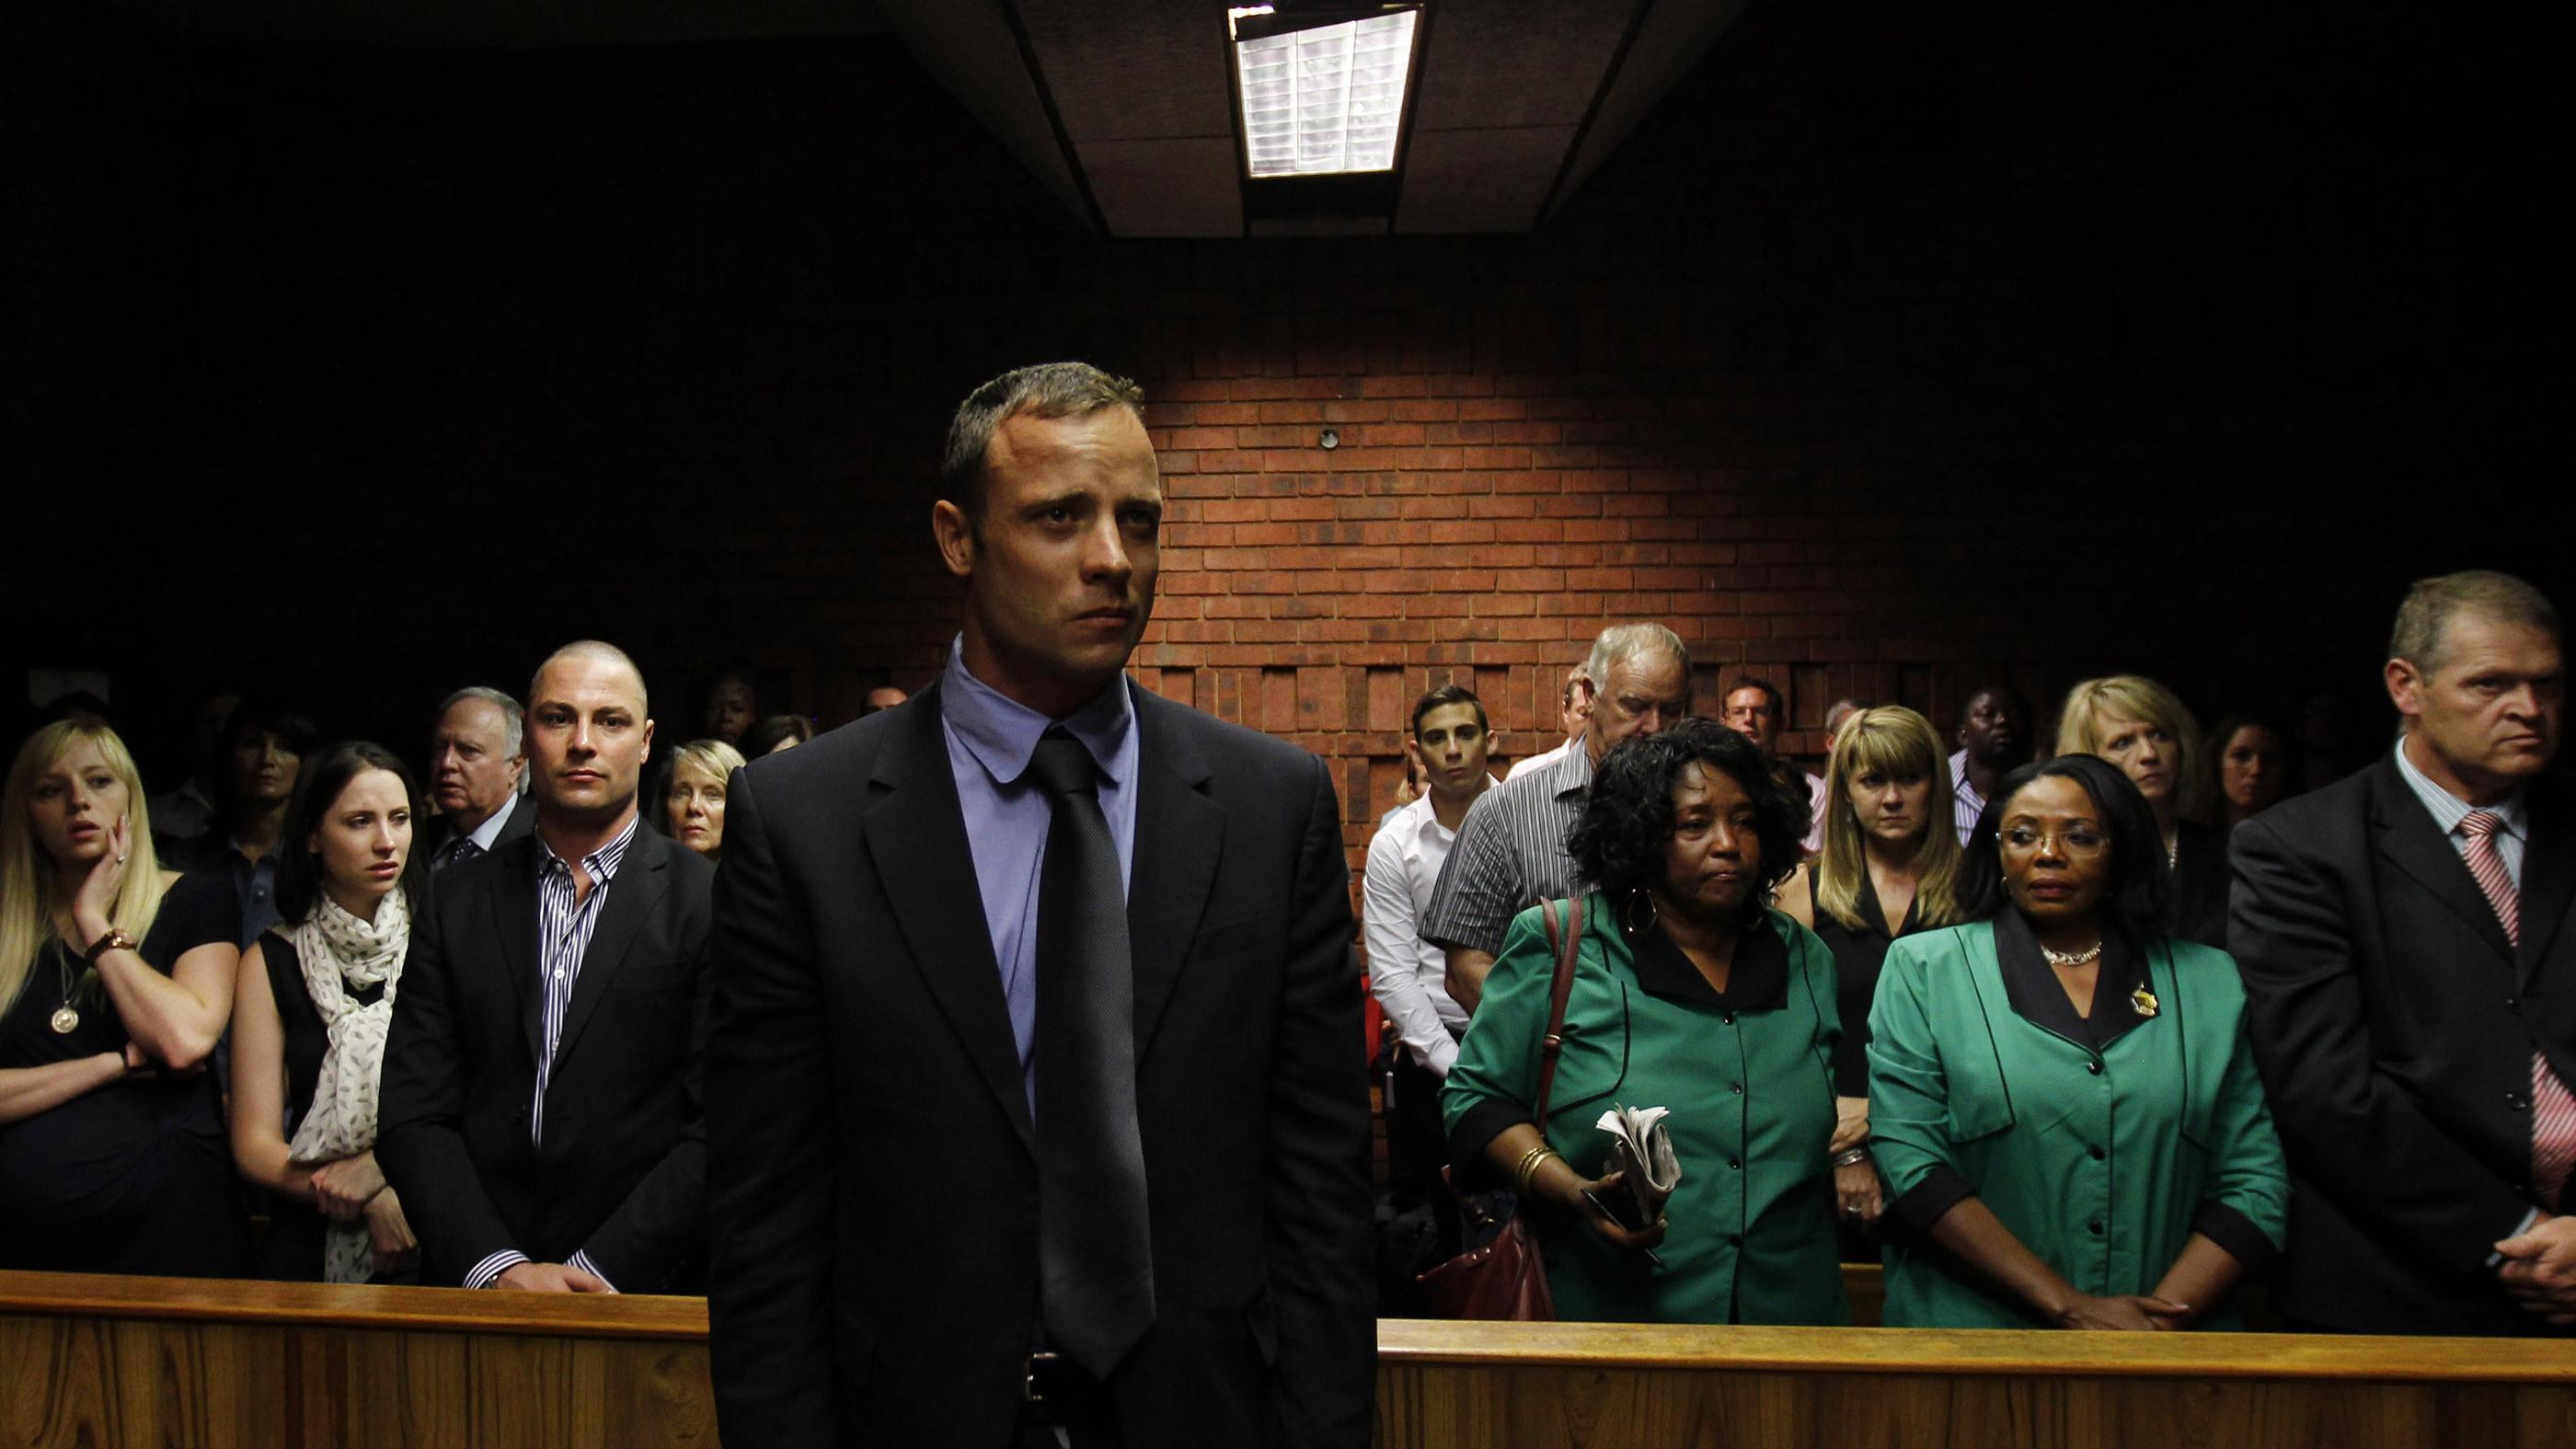 Oscar Pistorius awaits the start of court proceedings in the Pretoria Magistrates court.